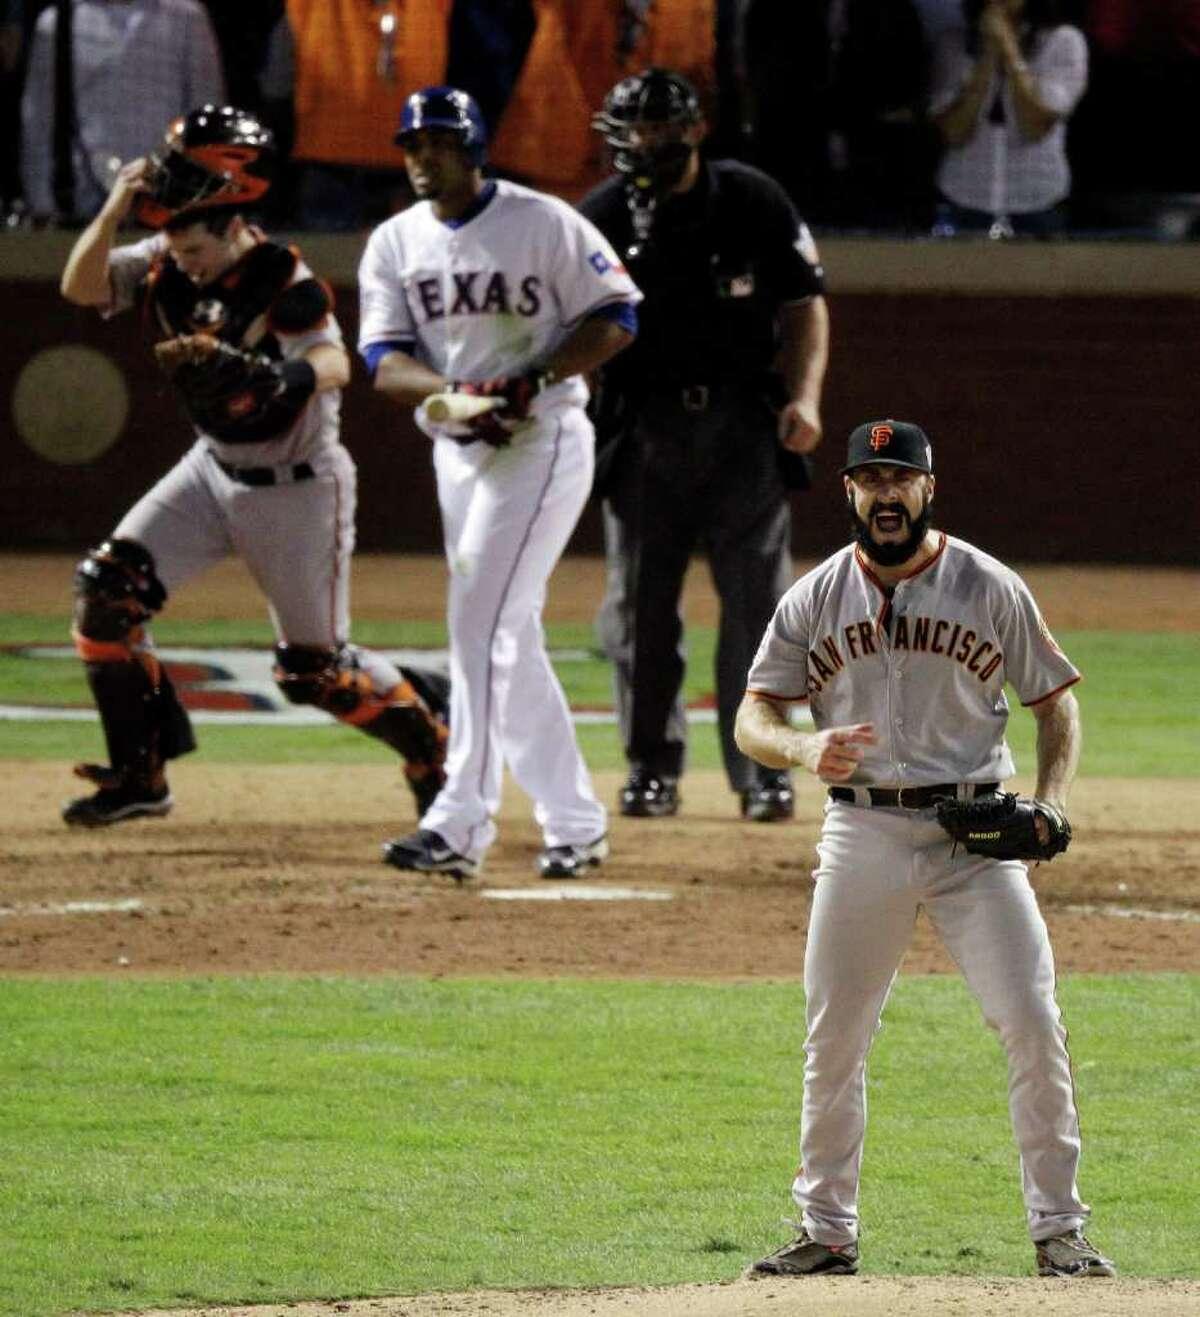 San Francisco Giants' Brian Wilson after striking out Texas Rangers' Nelson Cruz to win baseball's World Series 3-1 Monday, Nov. 1, 2010, in Arlington, Texas. (AP Photo/Eric Gay)